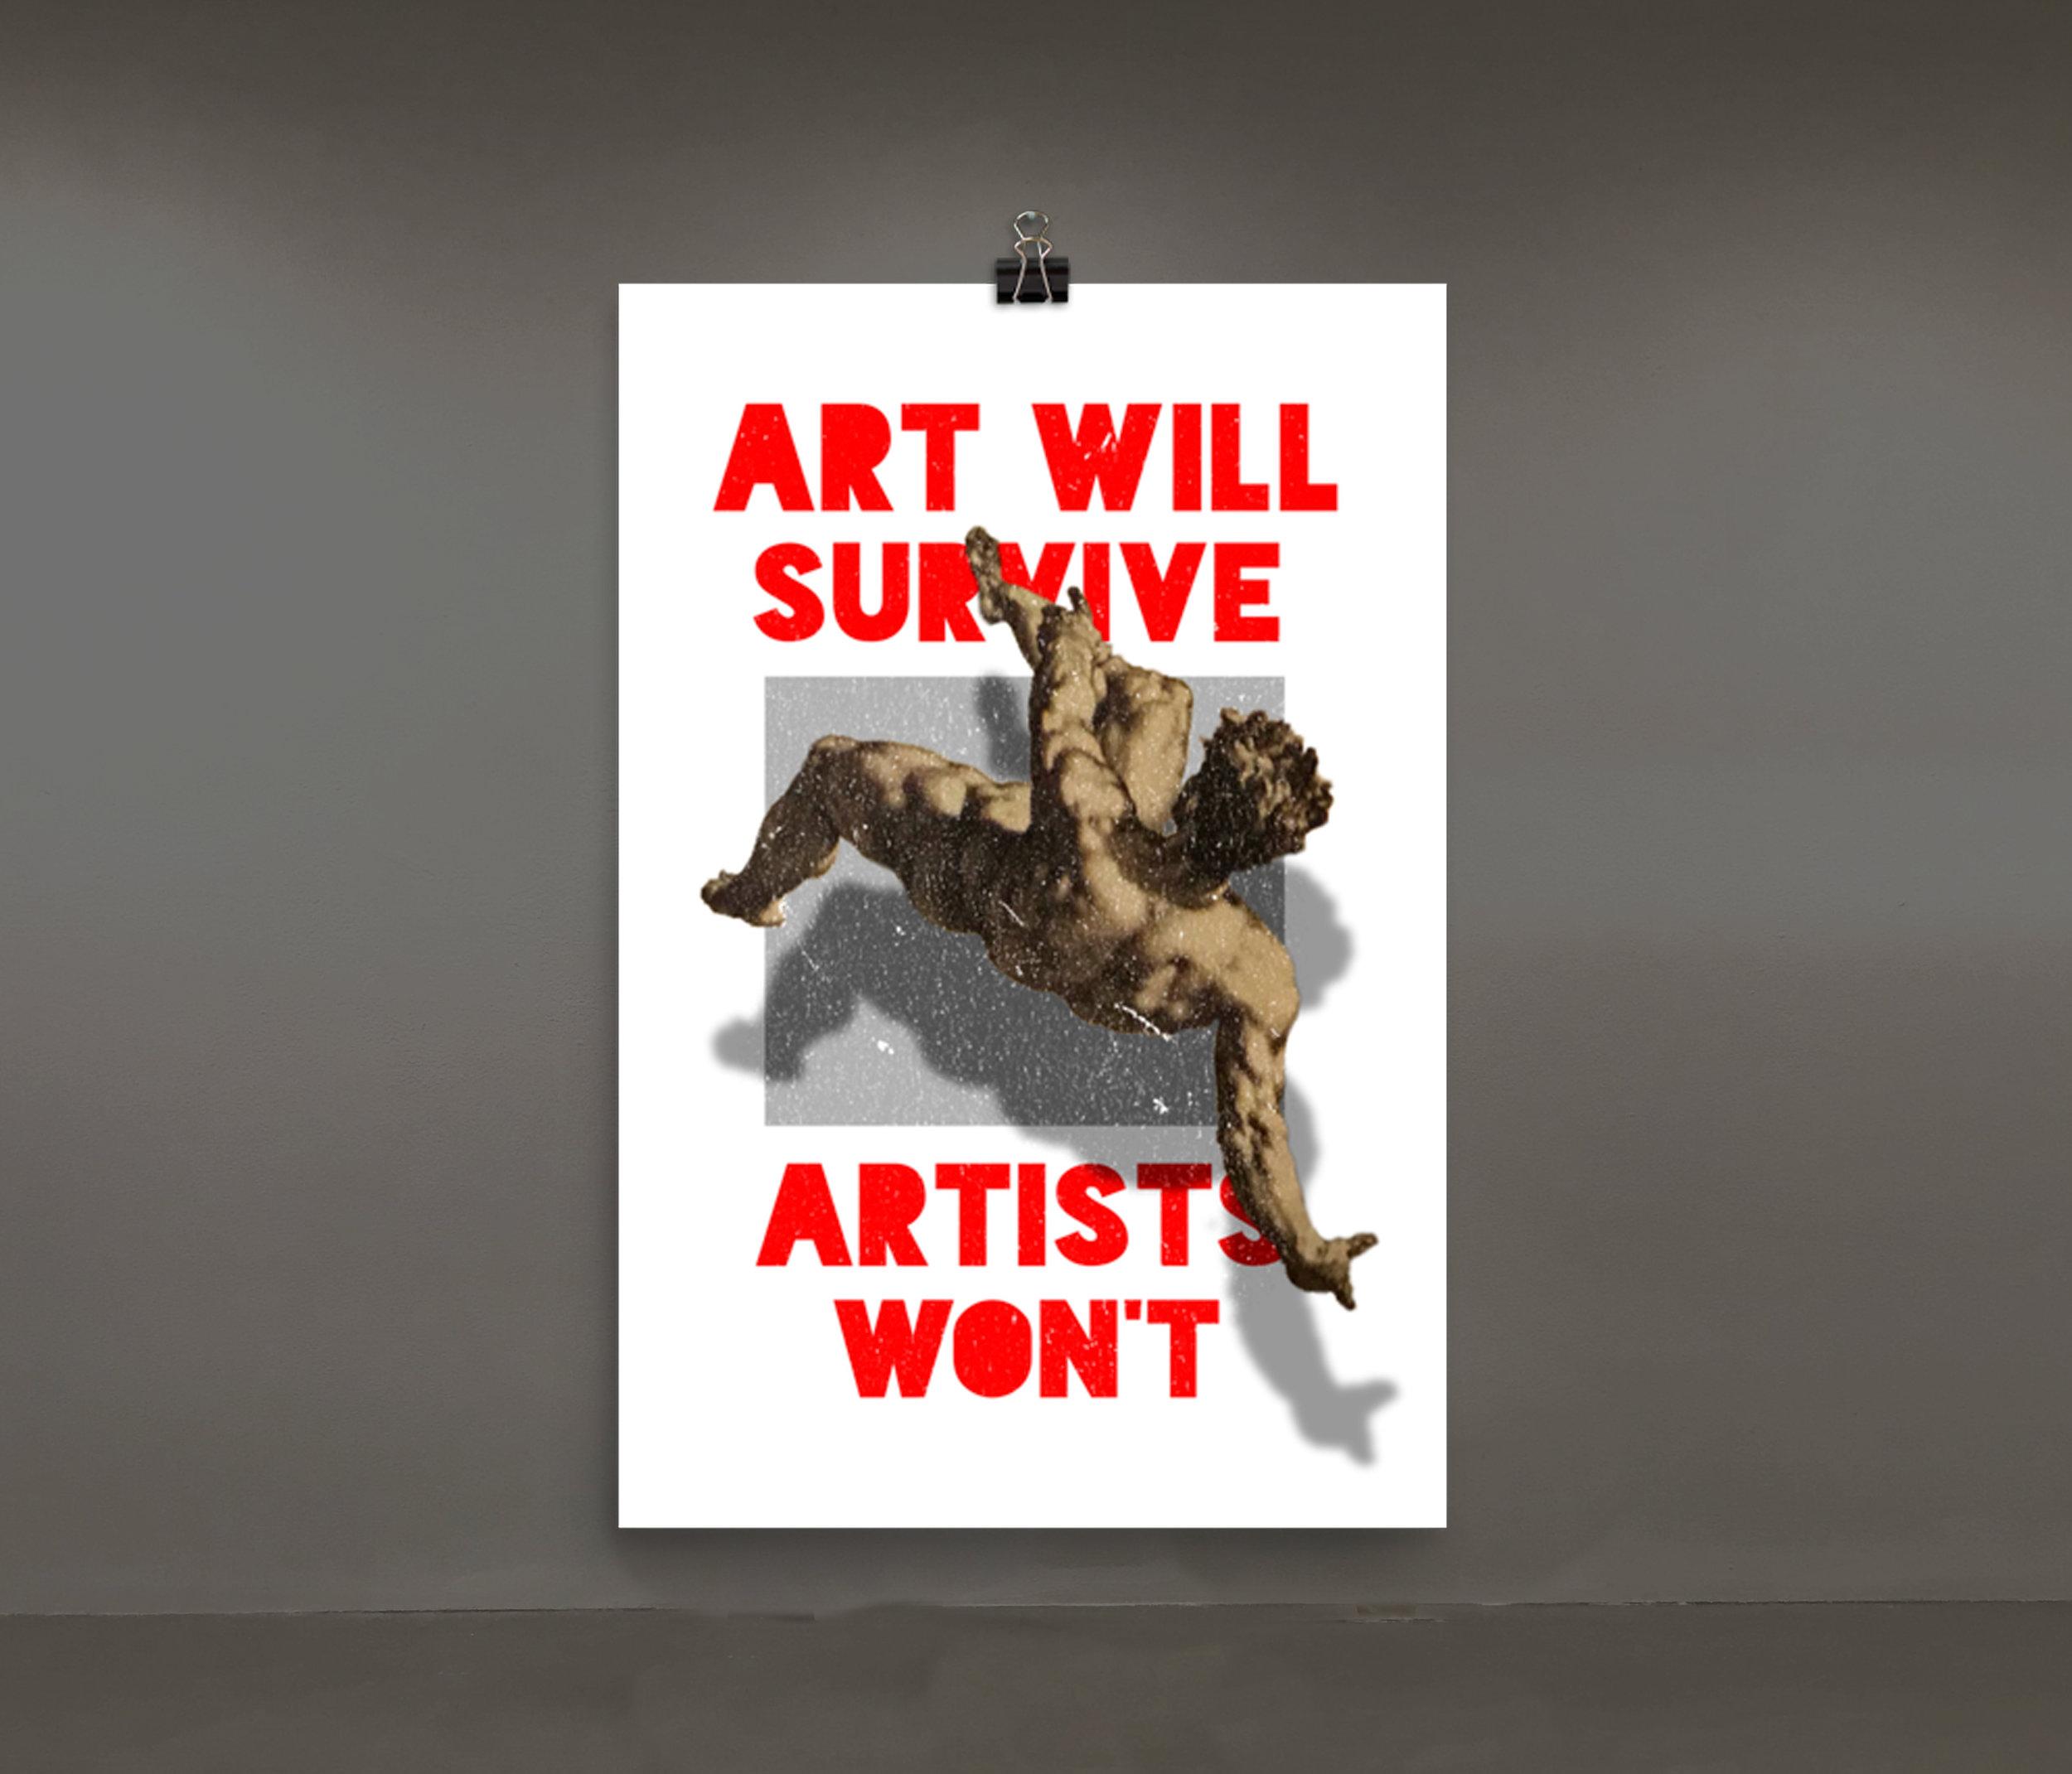 Art-Will-Survive-12x18-Poster-IG.jpg